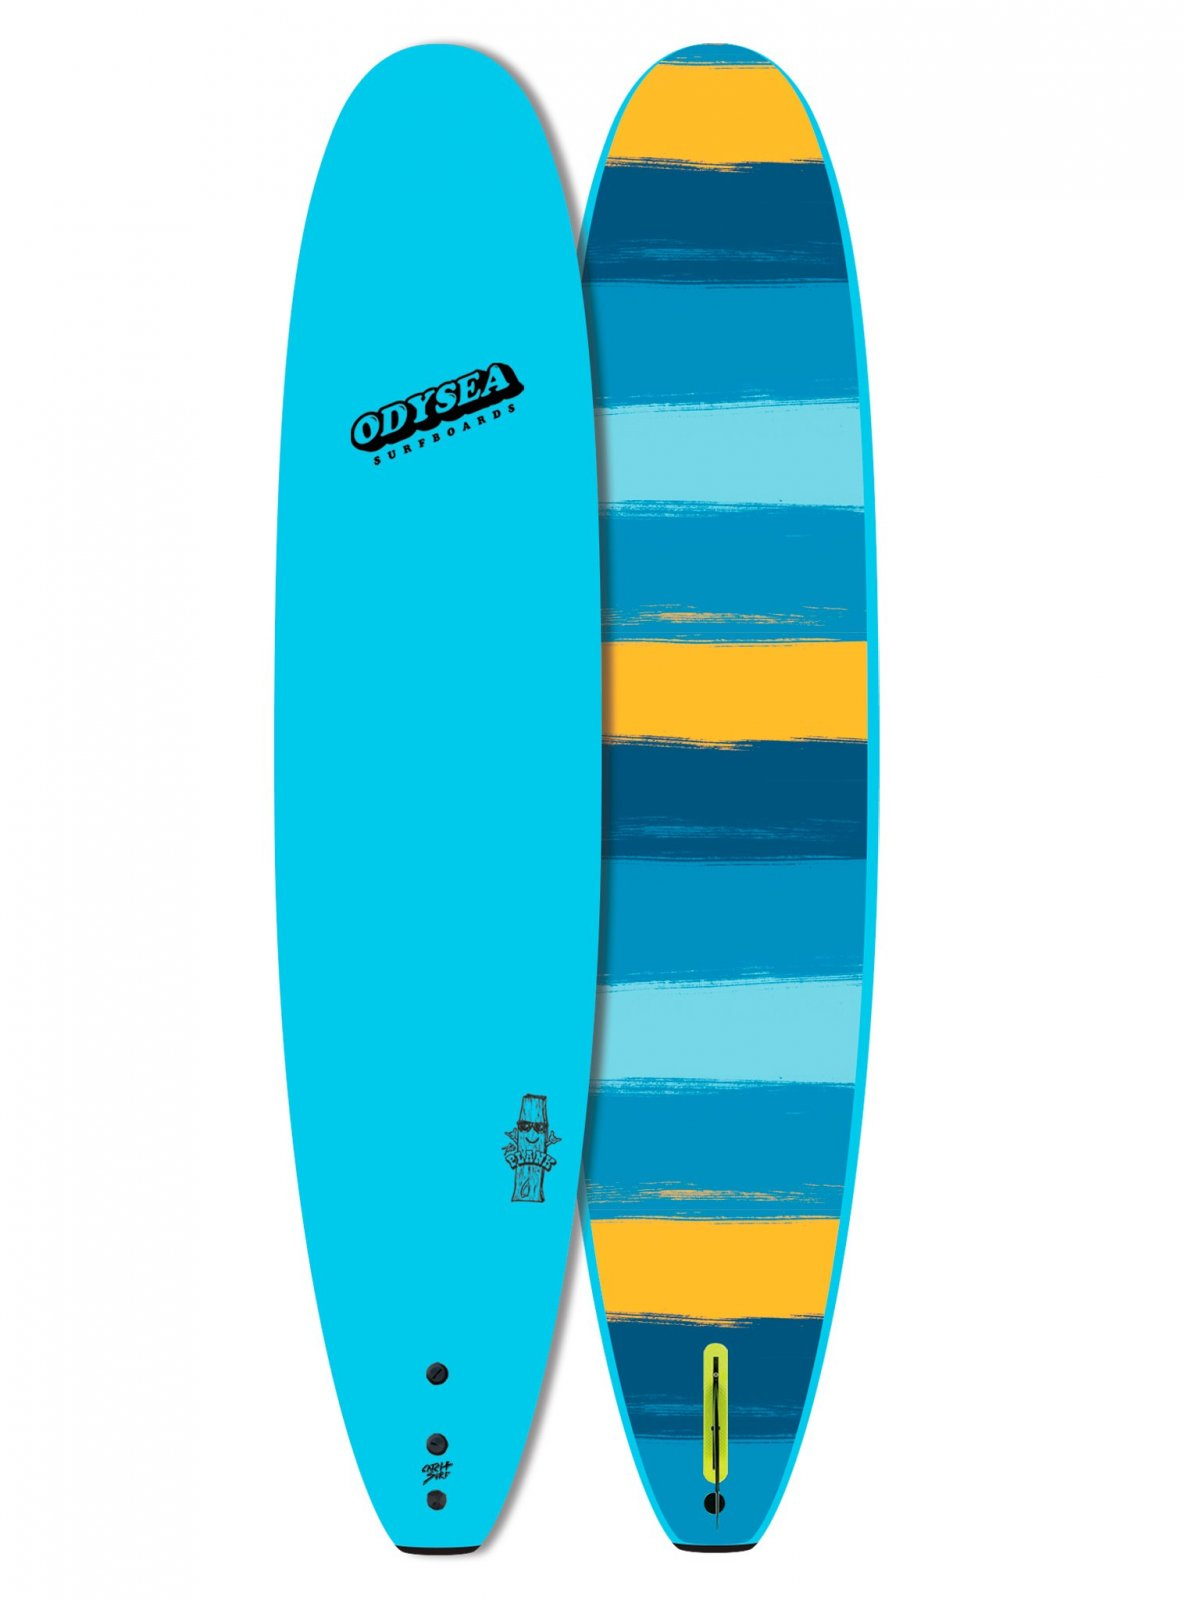 2020 Odysea 9-0 Plank - Single Fin